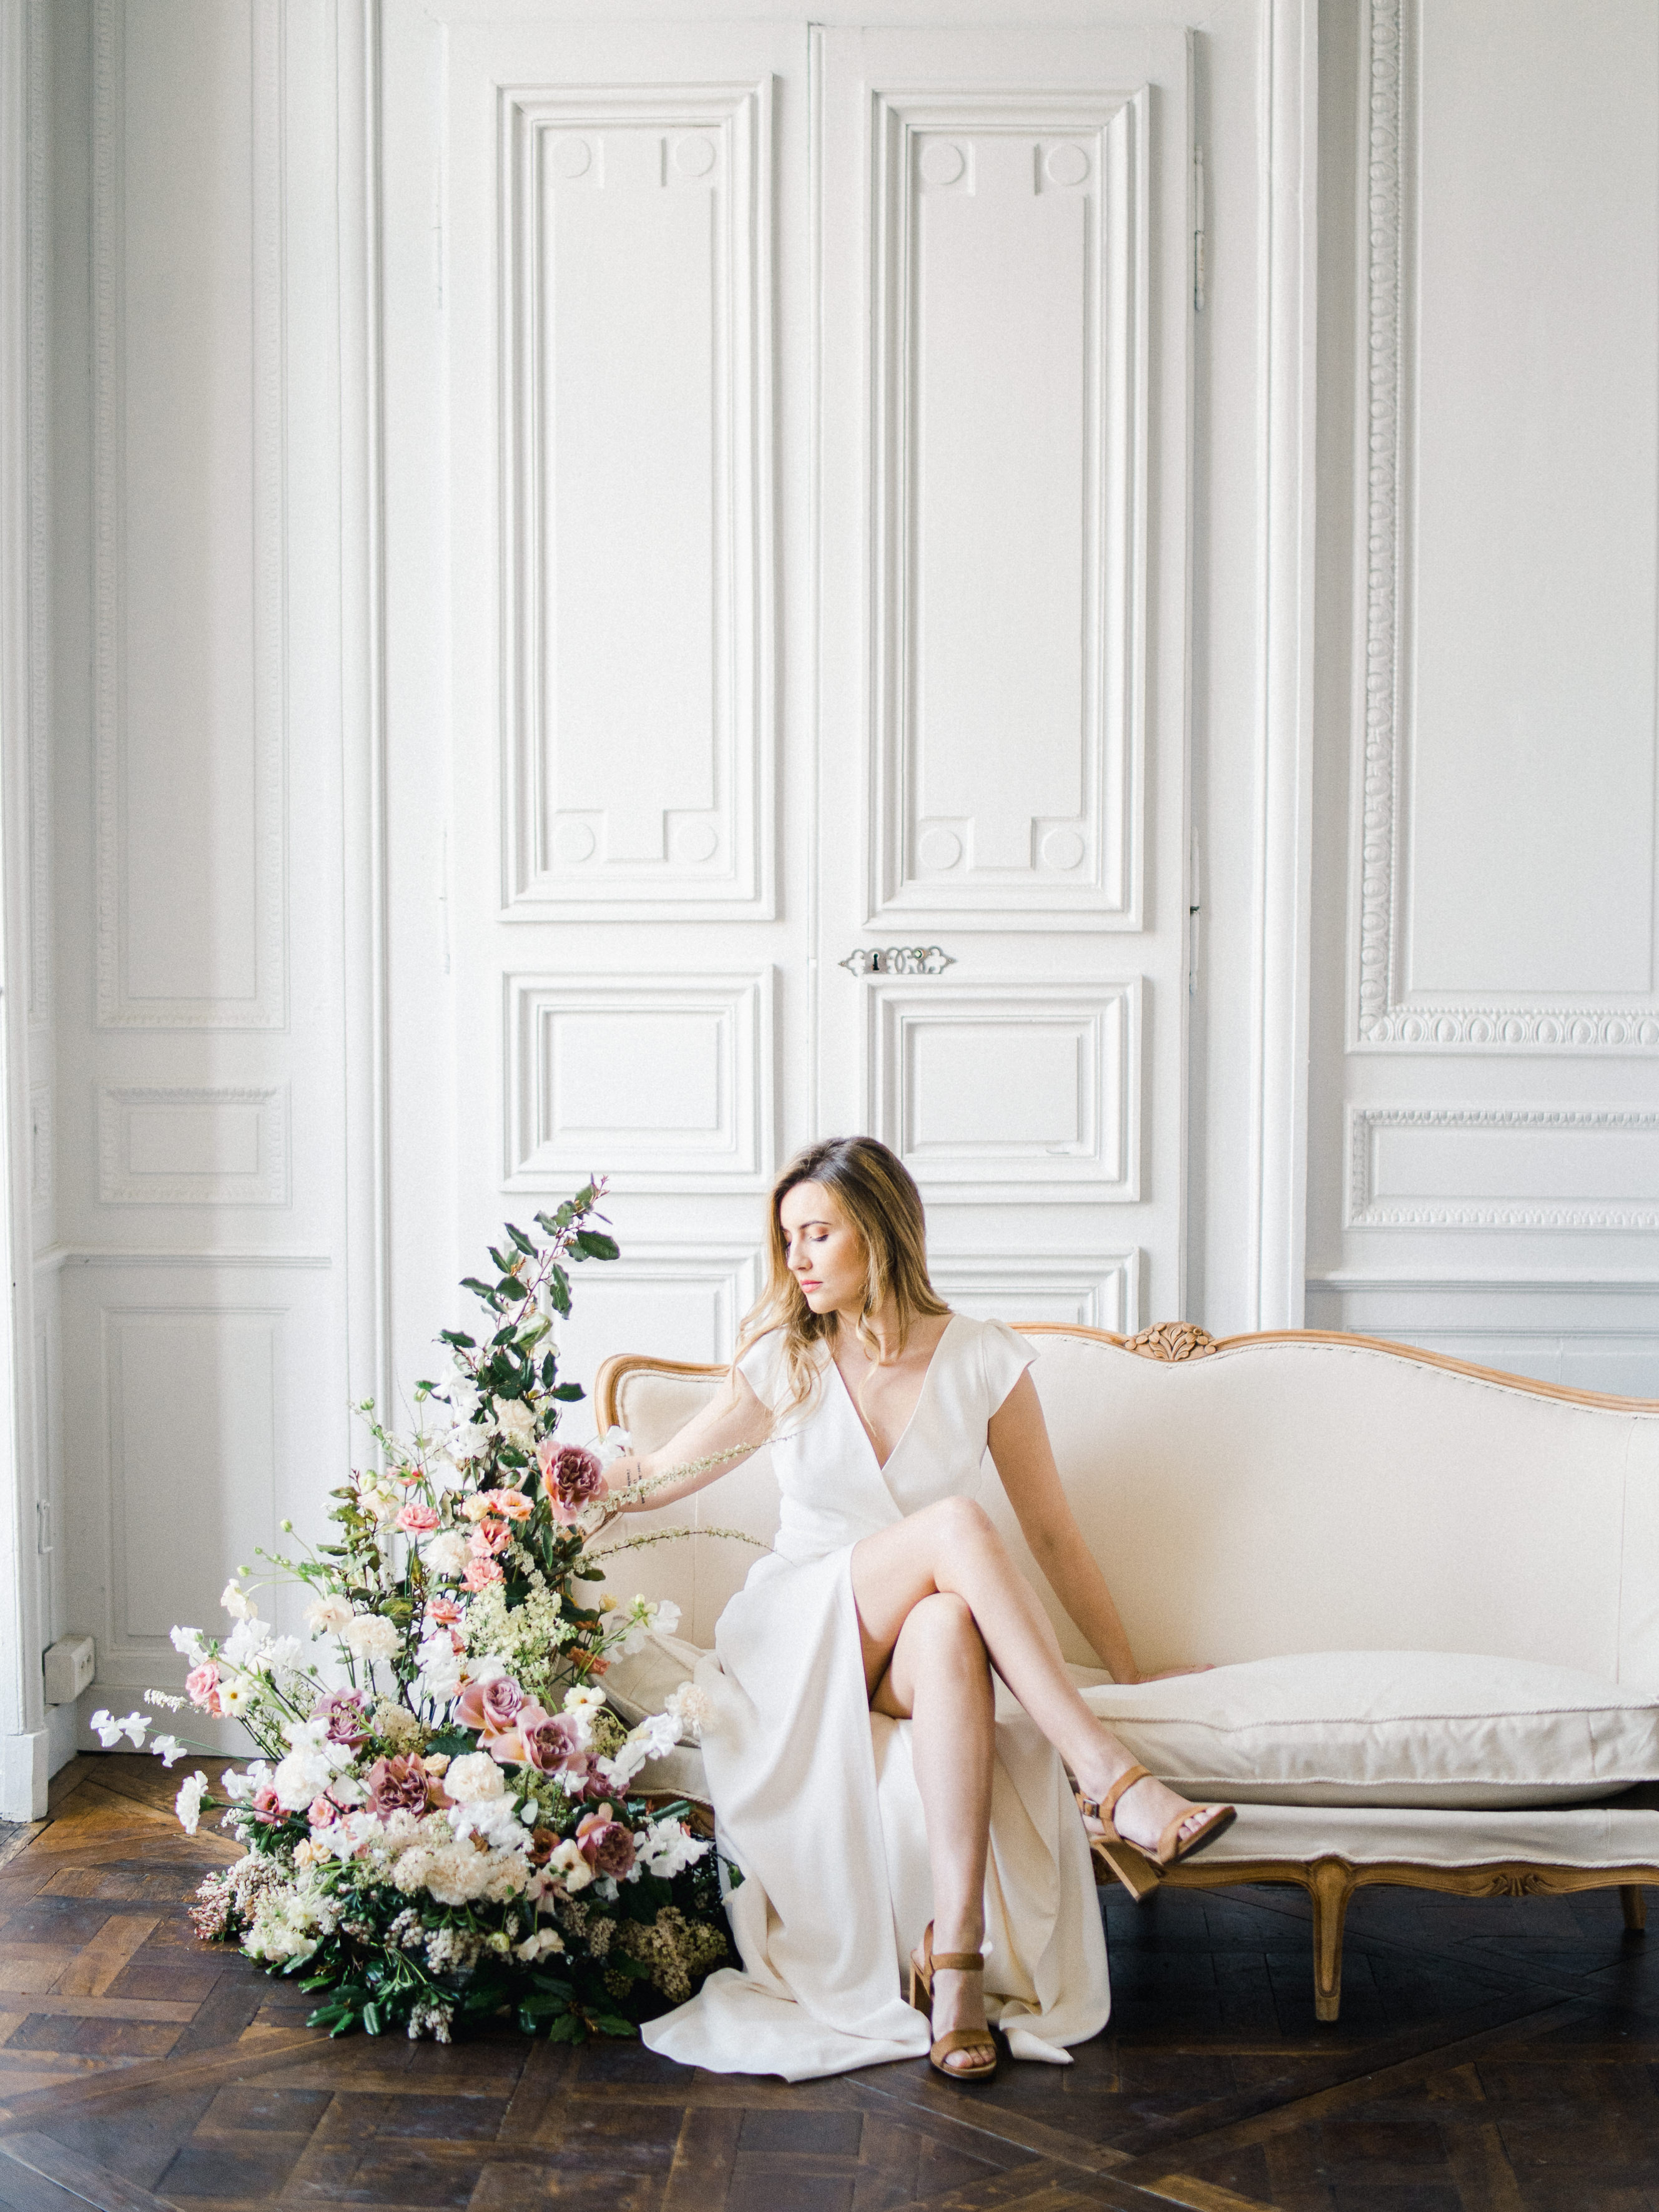 Elegant Whimsical French Chateau Wedding Inspiration Romain Vaucher 32